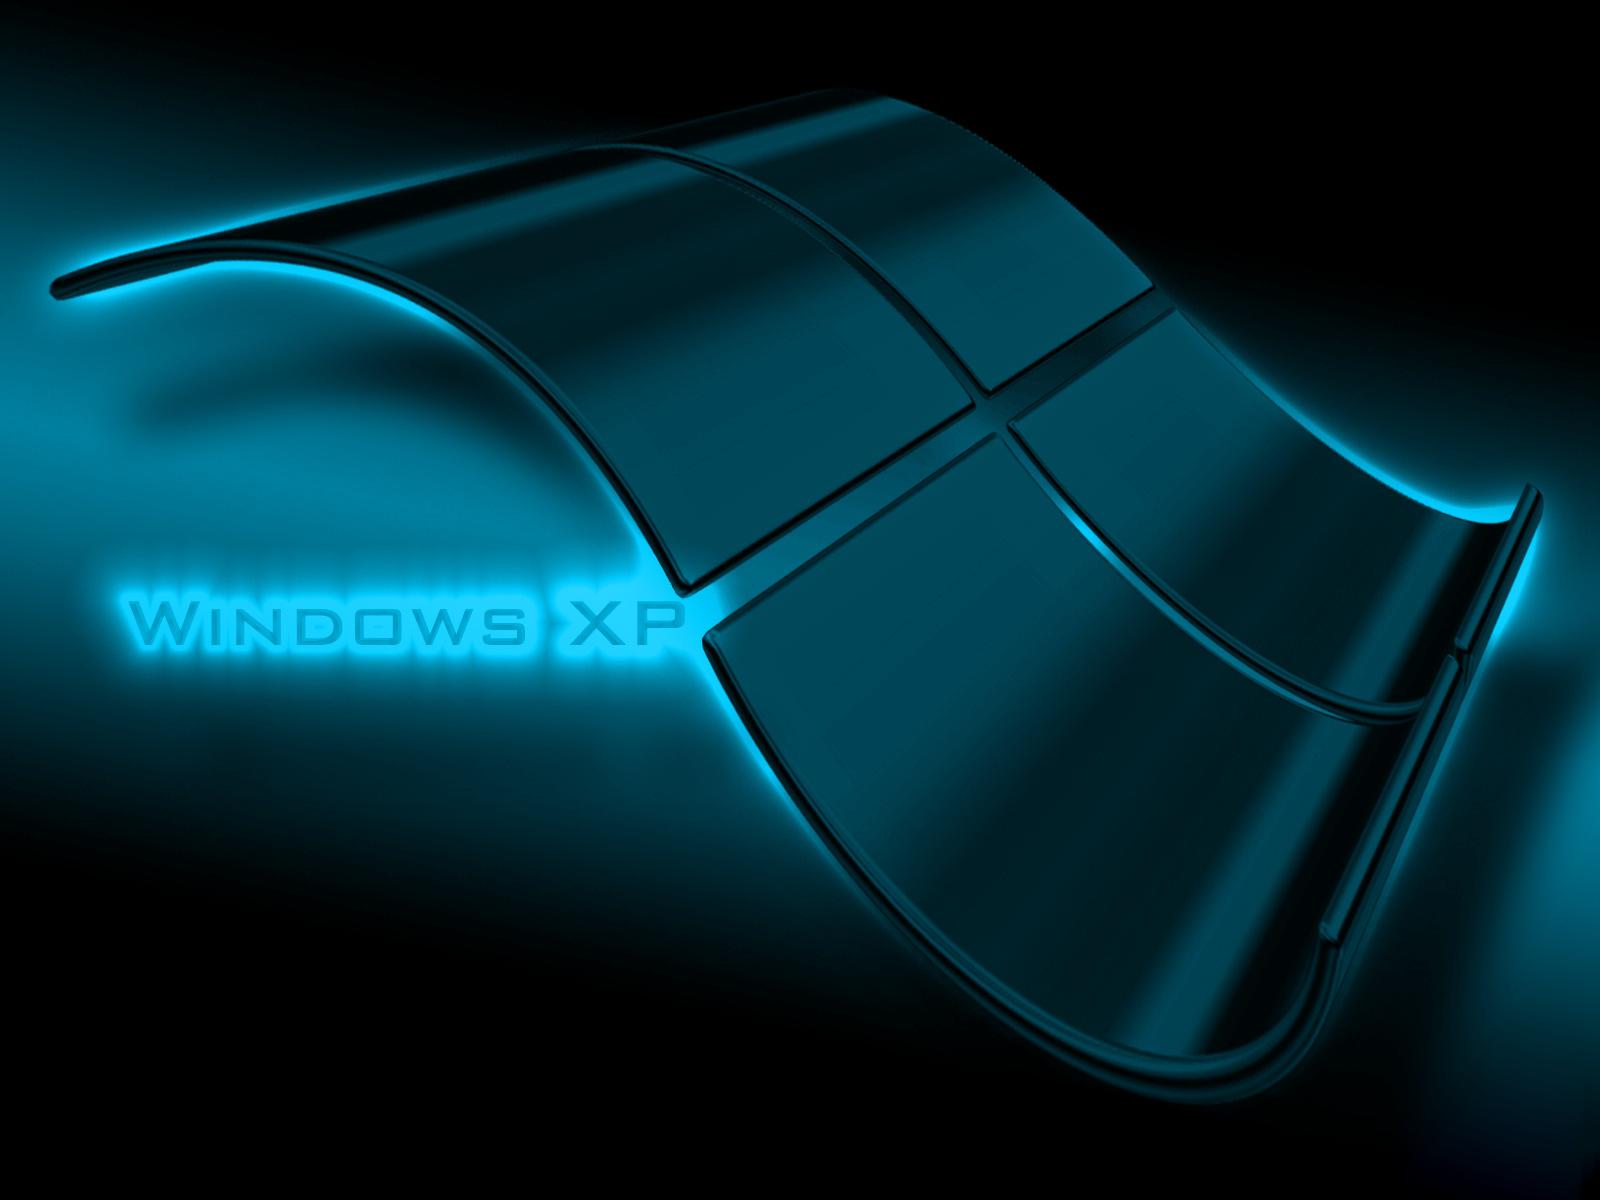 http://3.bp.blogspot.com/-osfQHL5PYzA/TYB0bN3kE4I/AAAAAAAAC4o/hyBKVi0WZu0/s1600/Windows_XP_Desktop_Theme.jpg